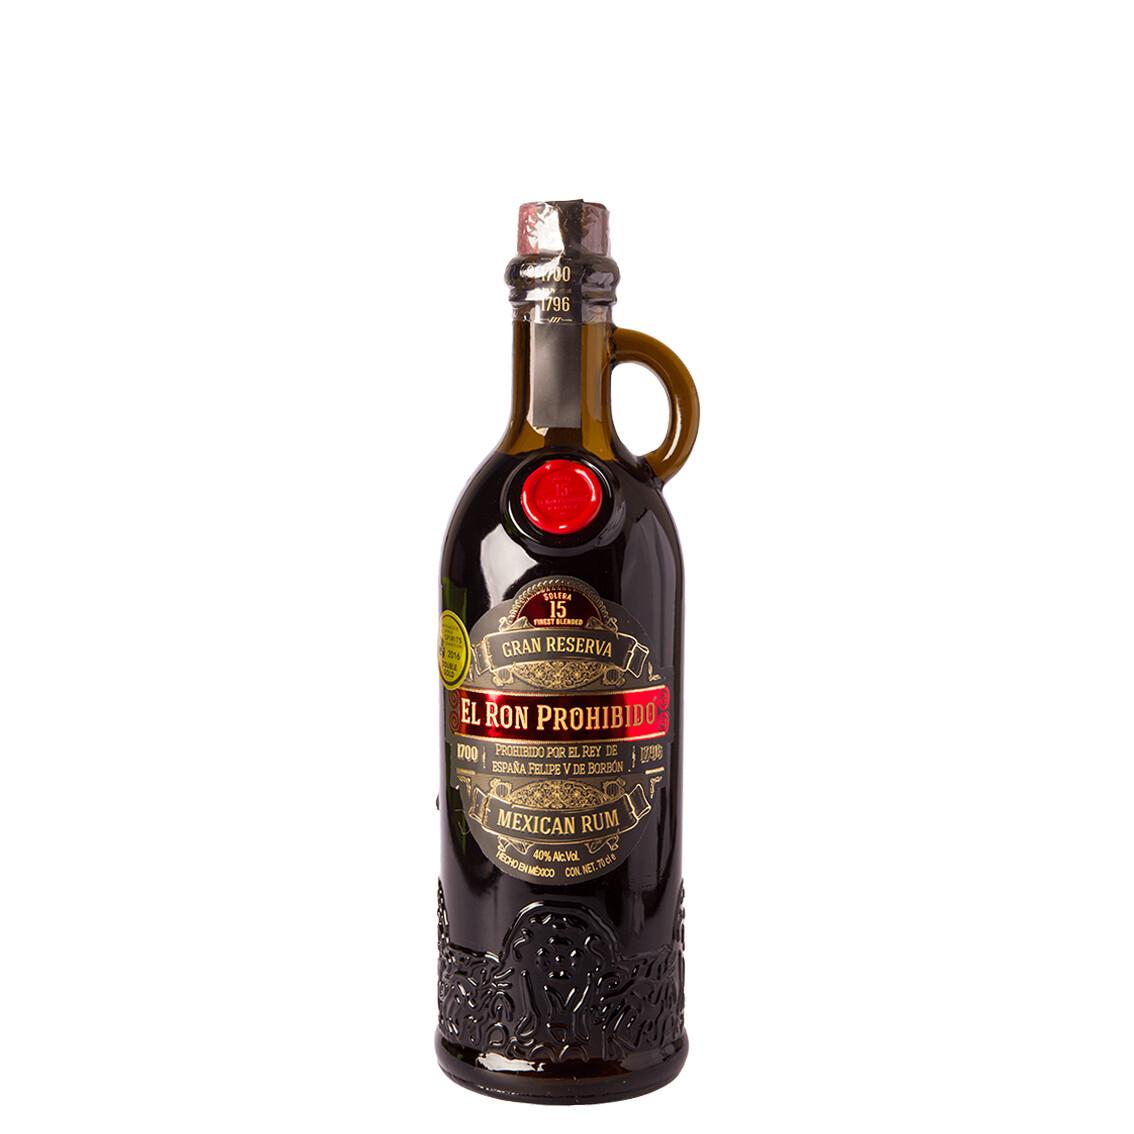 Mexican Rum 15 years di El Ron Prohibido